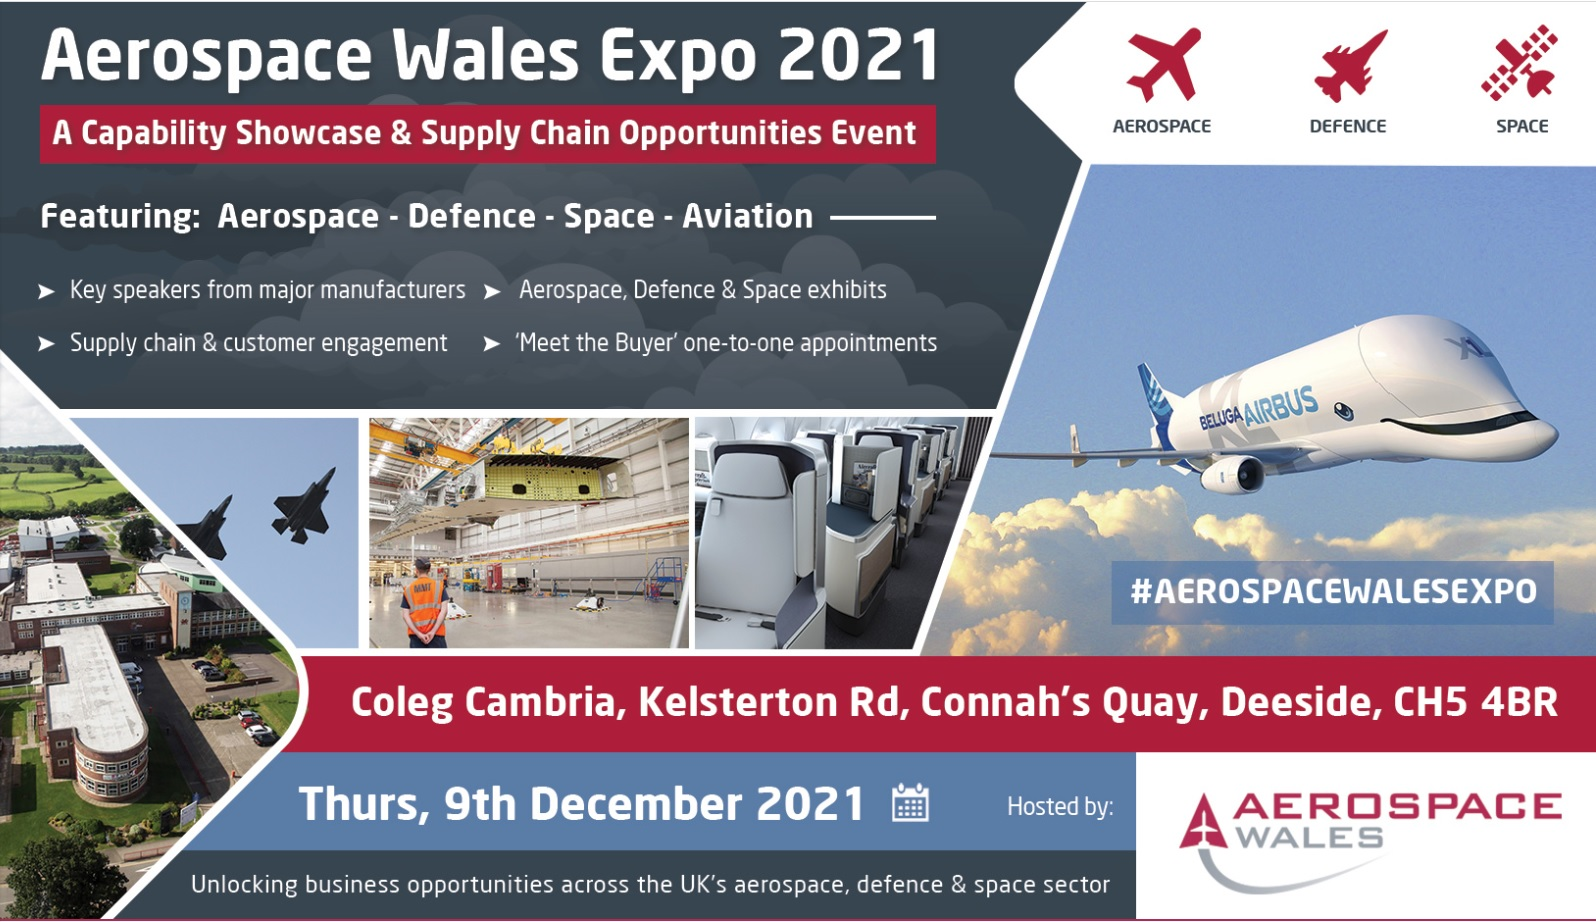 AVoptics exhibiting at Aerospace Wales Expo 2021